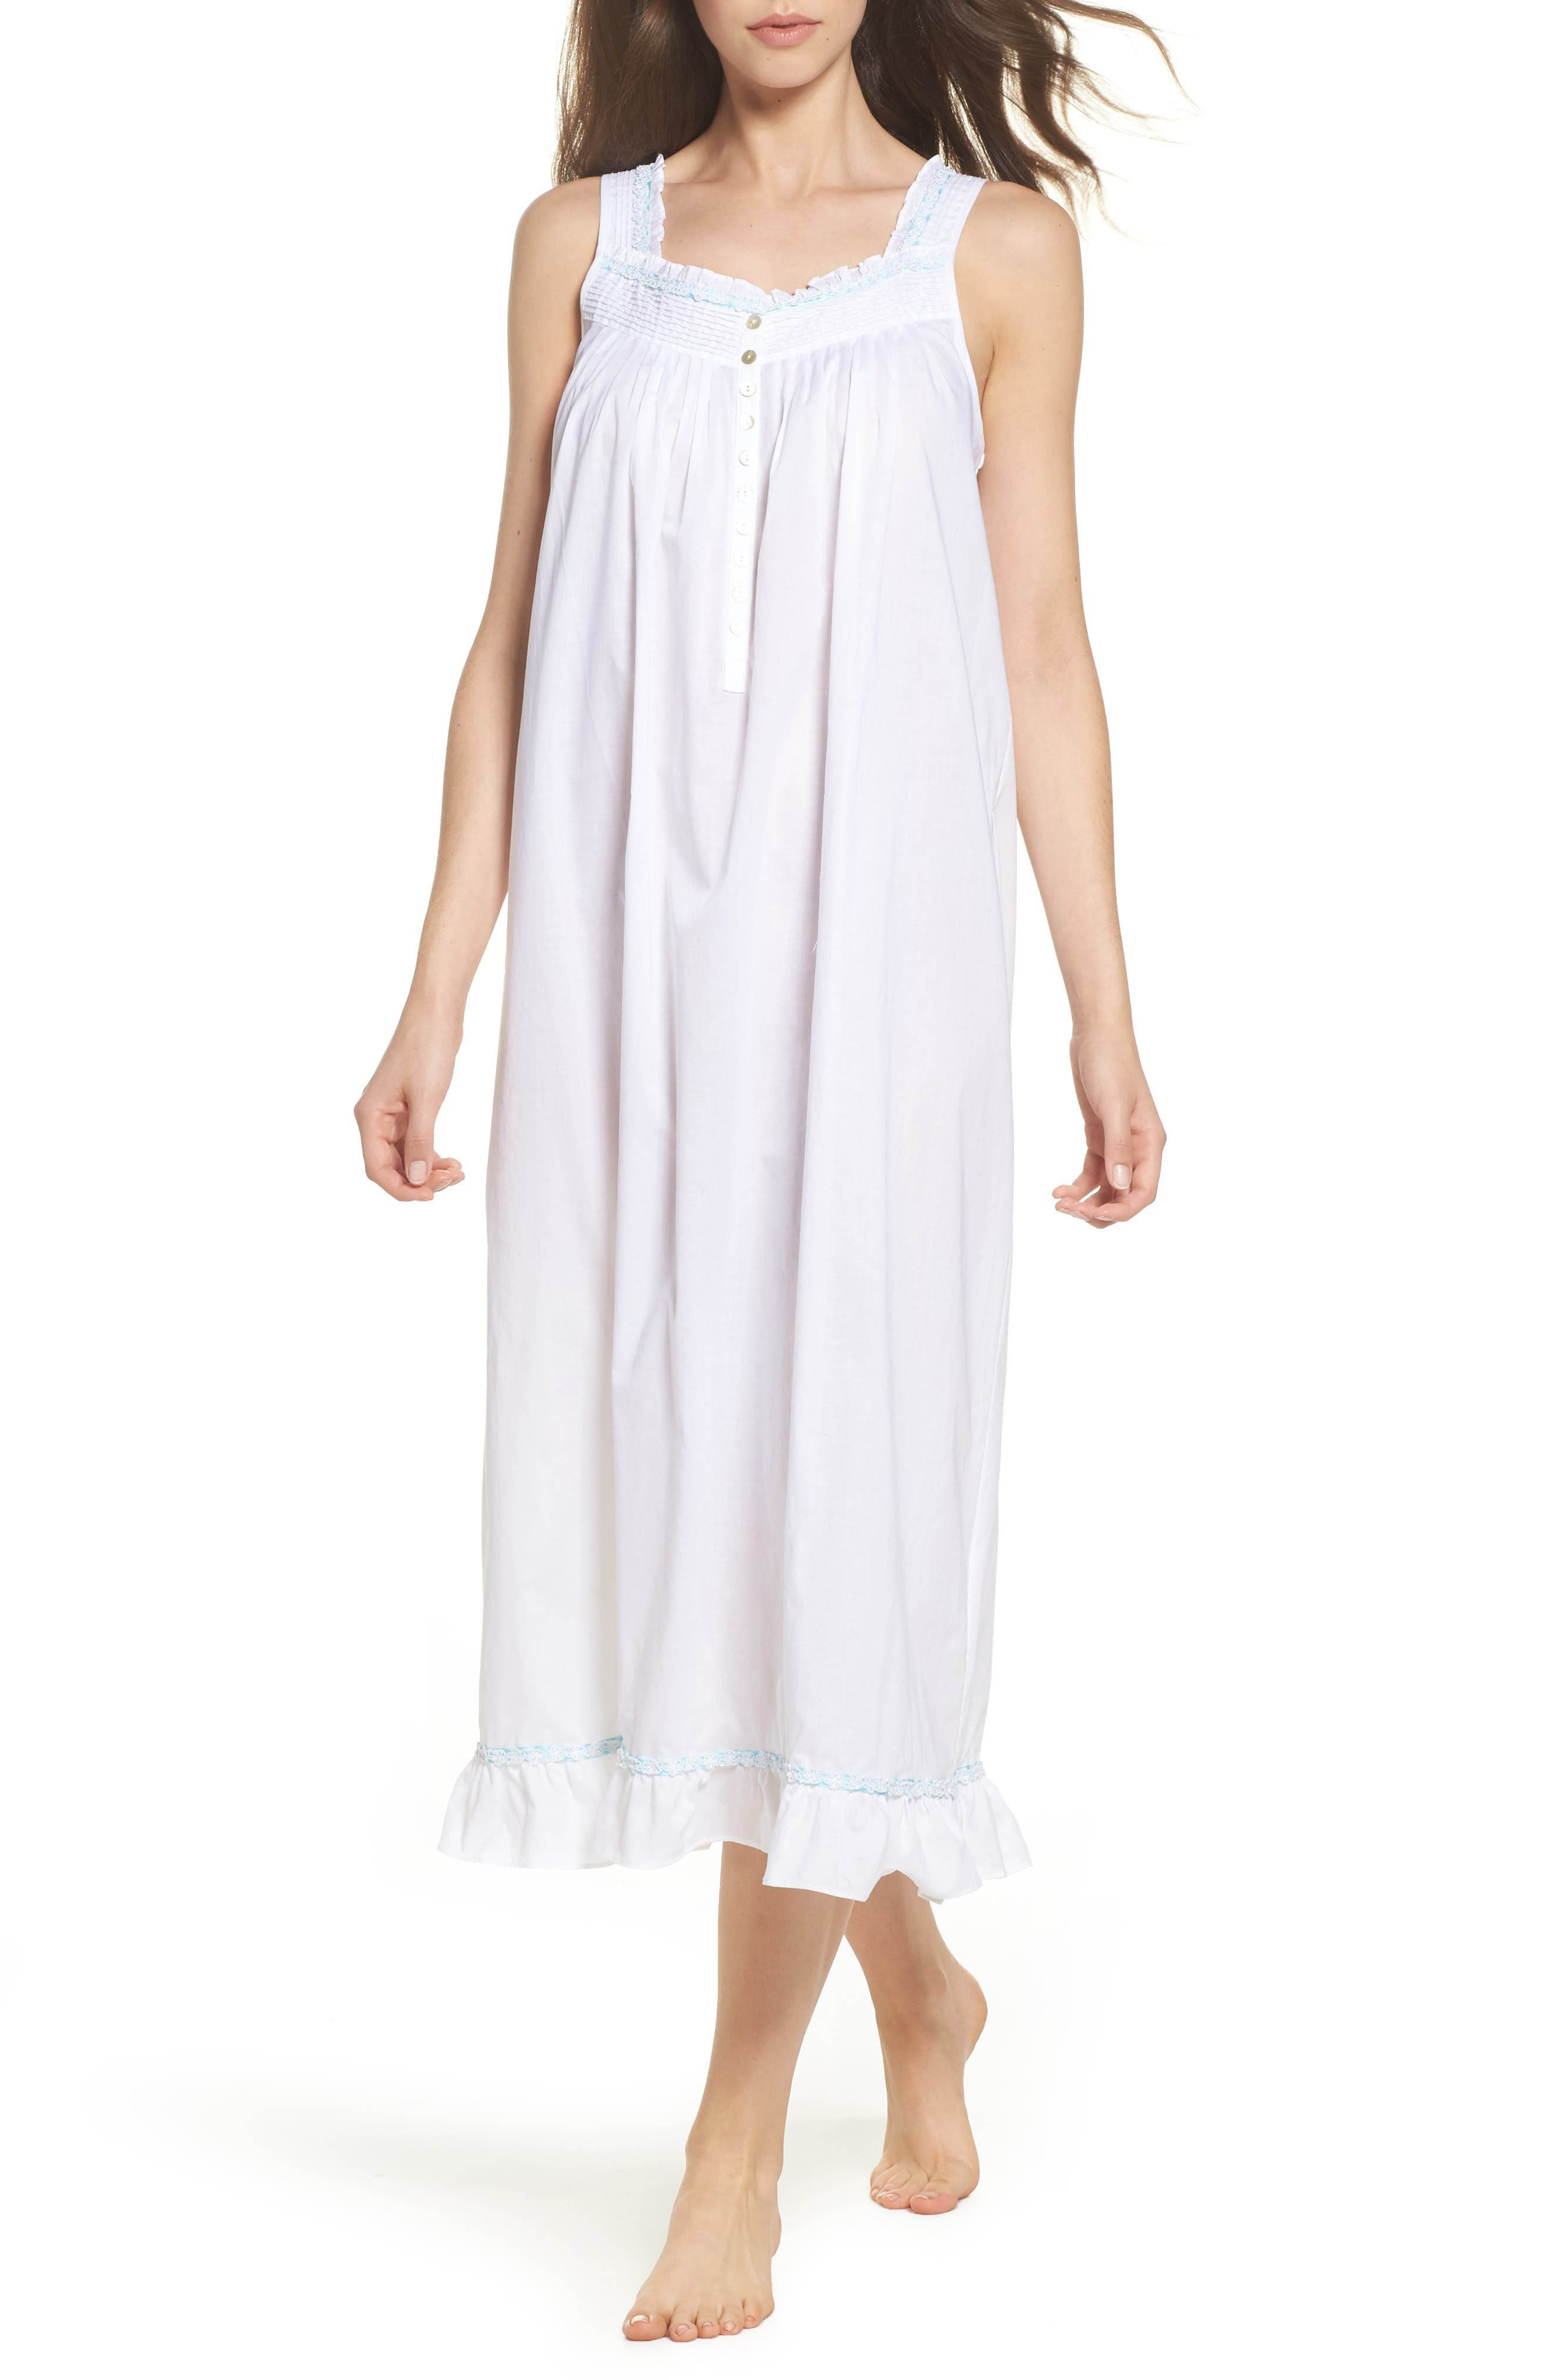 Cotton Lawn Ballet Nightgown,                             Main thumbnail 1, color,                             100